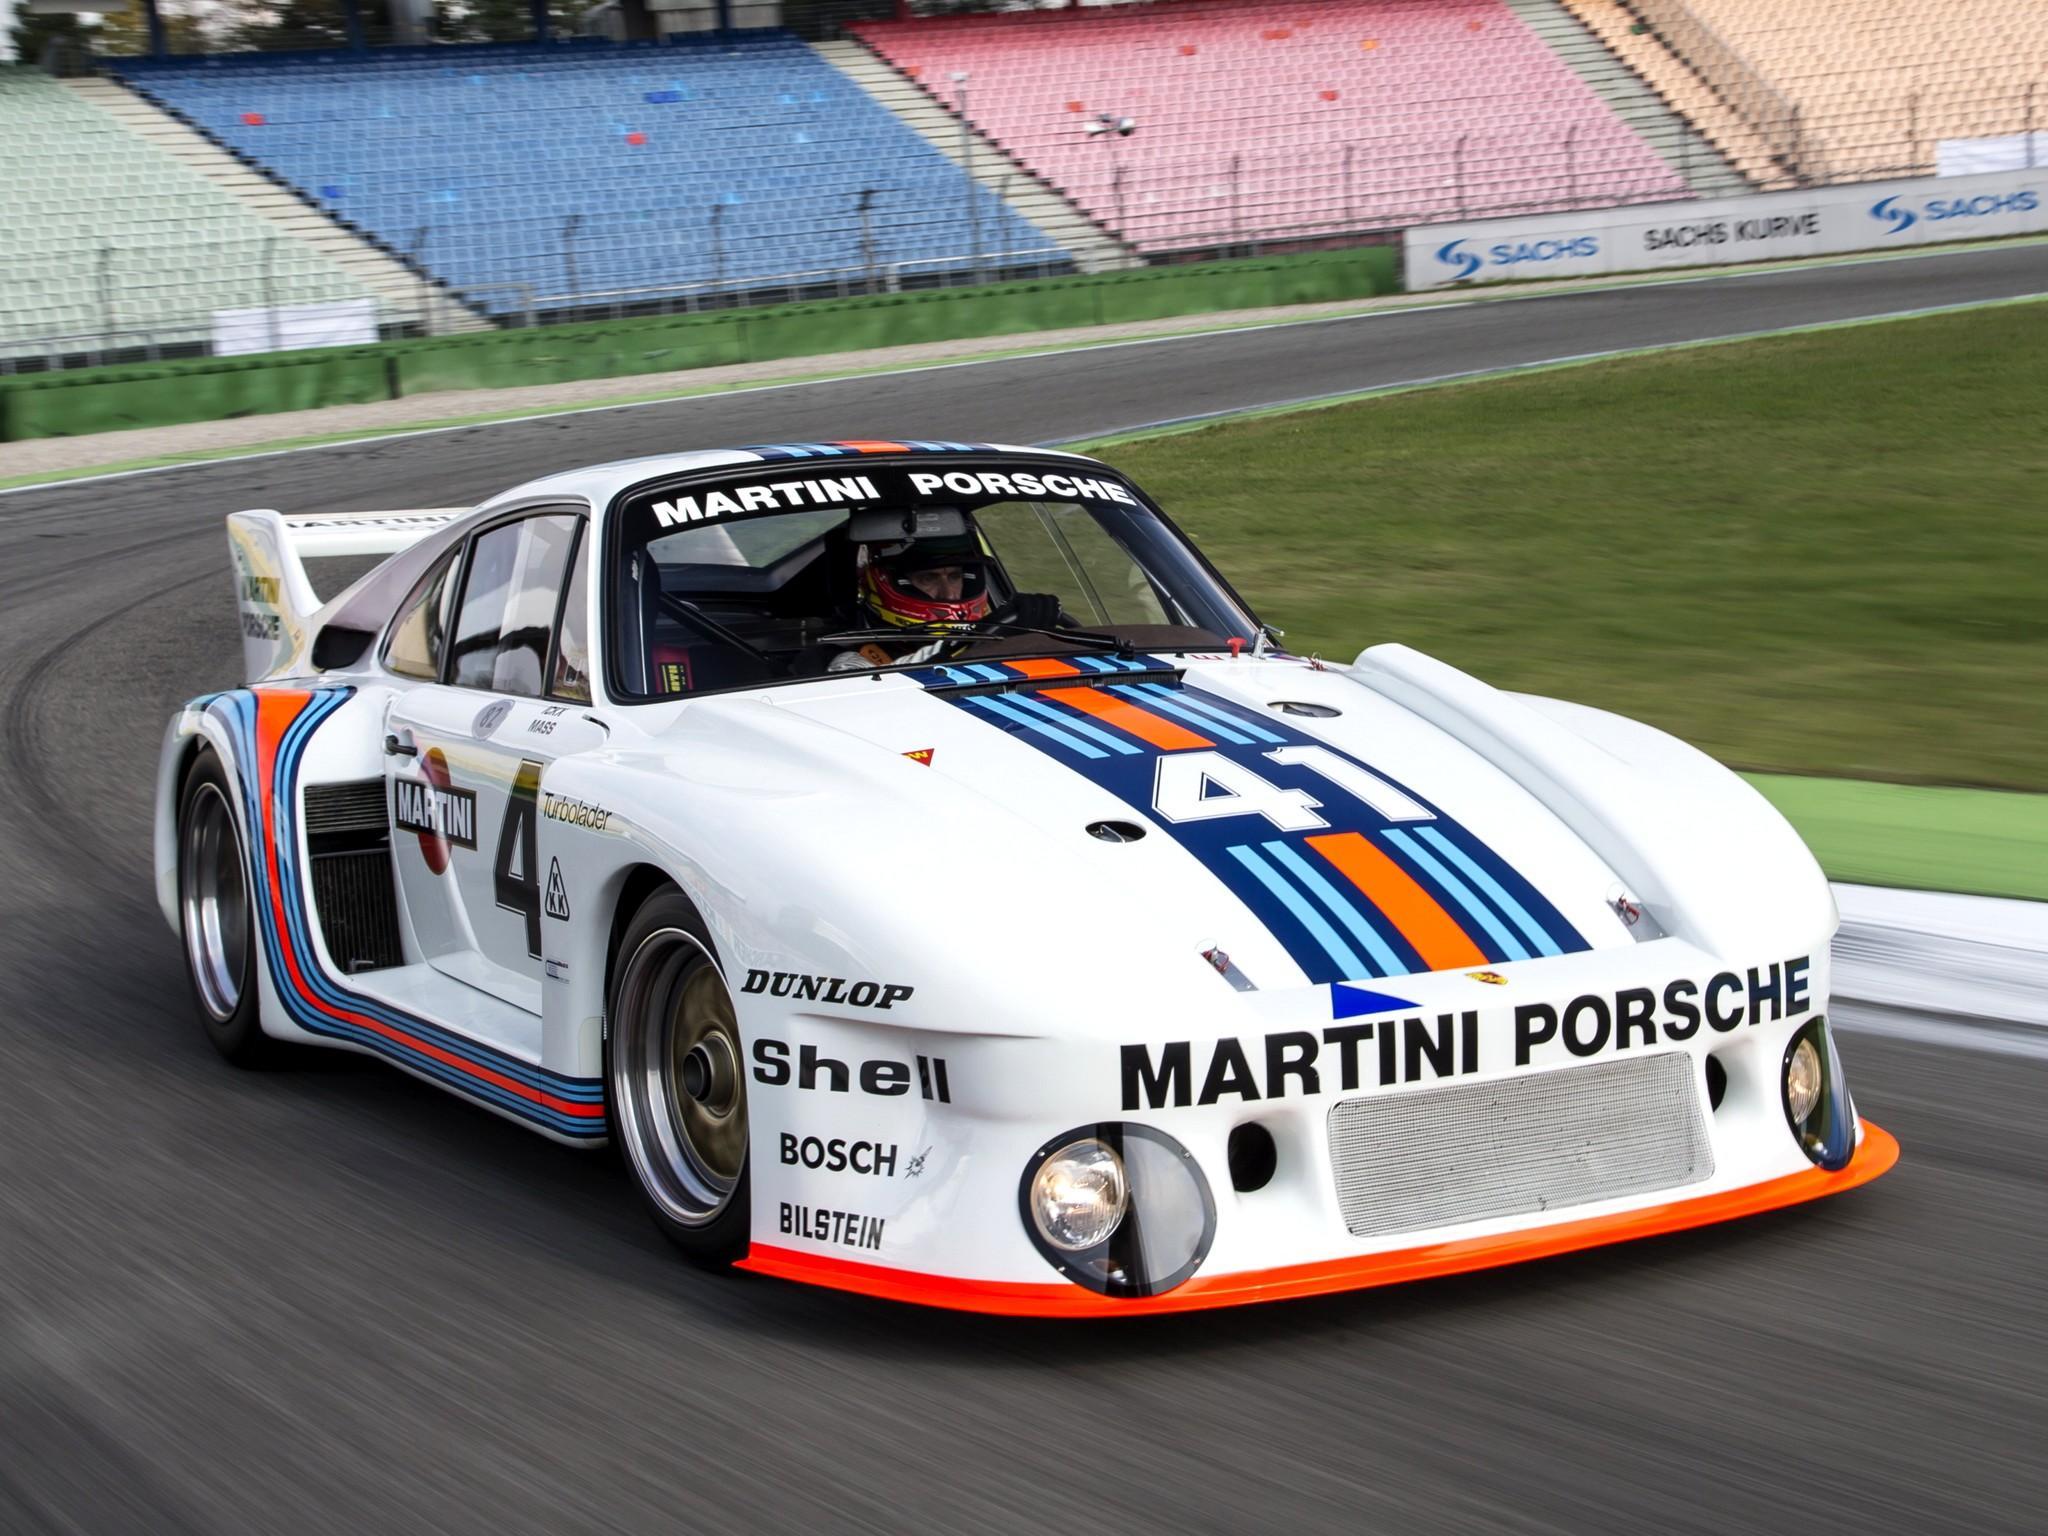 Porsche 935 wallpapers HD quality